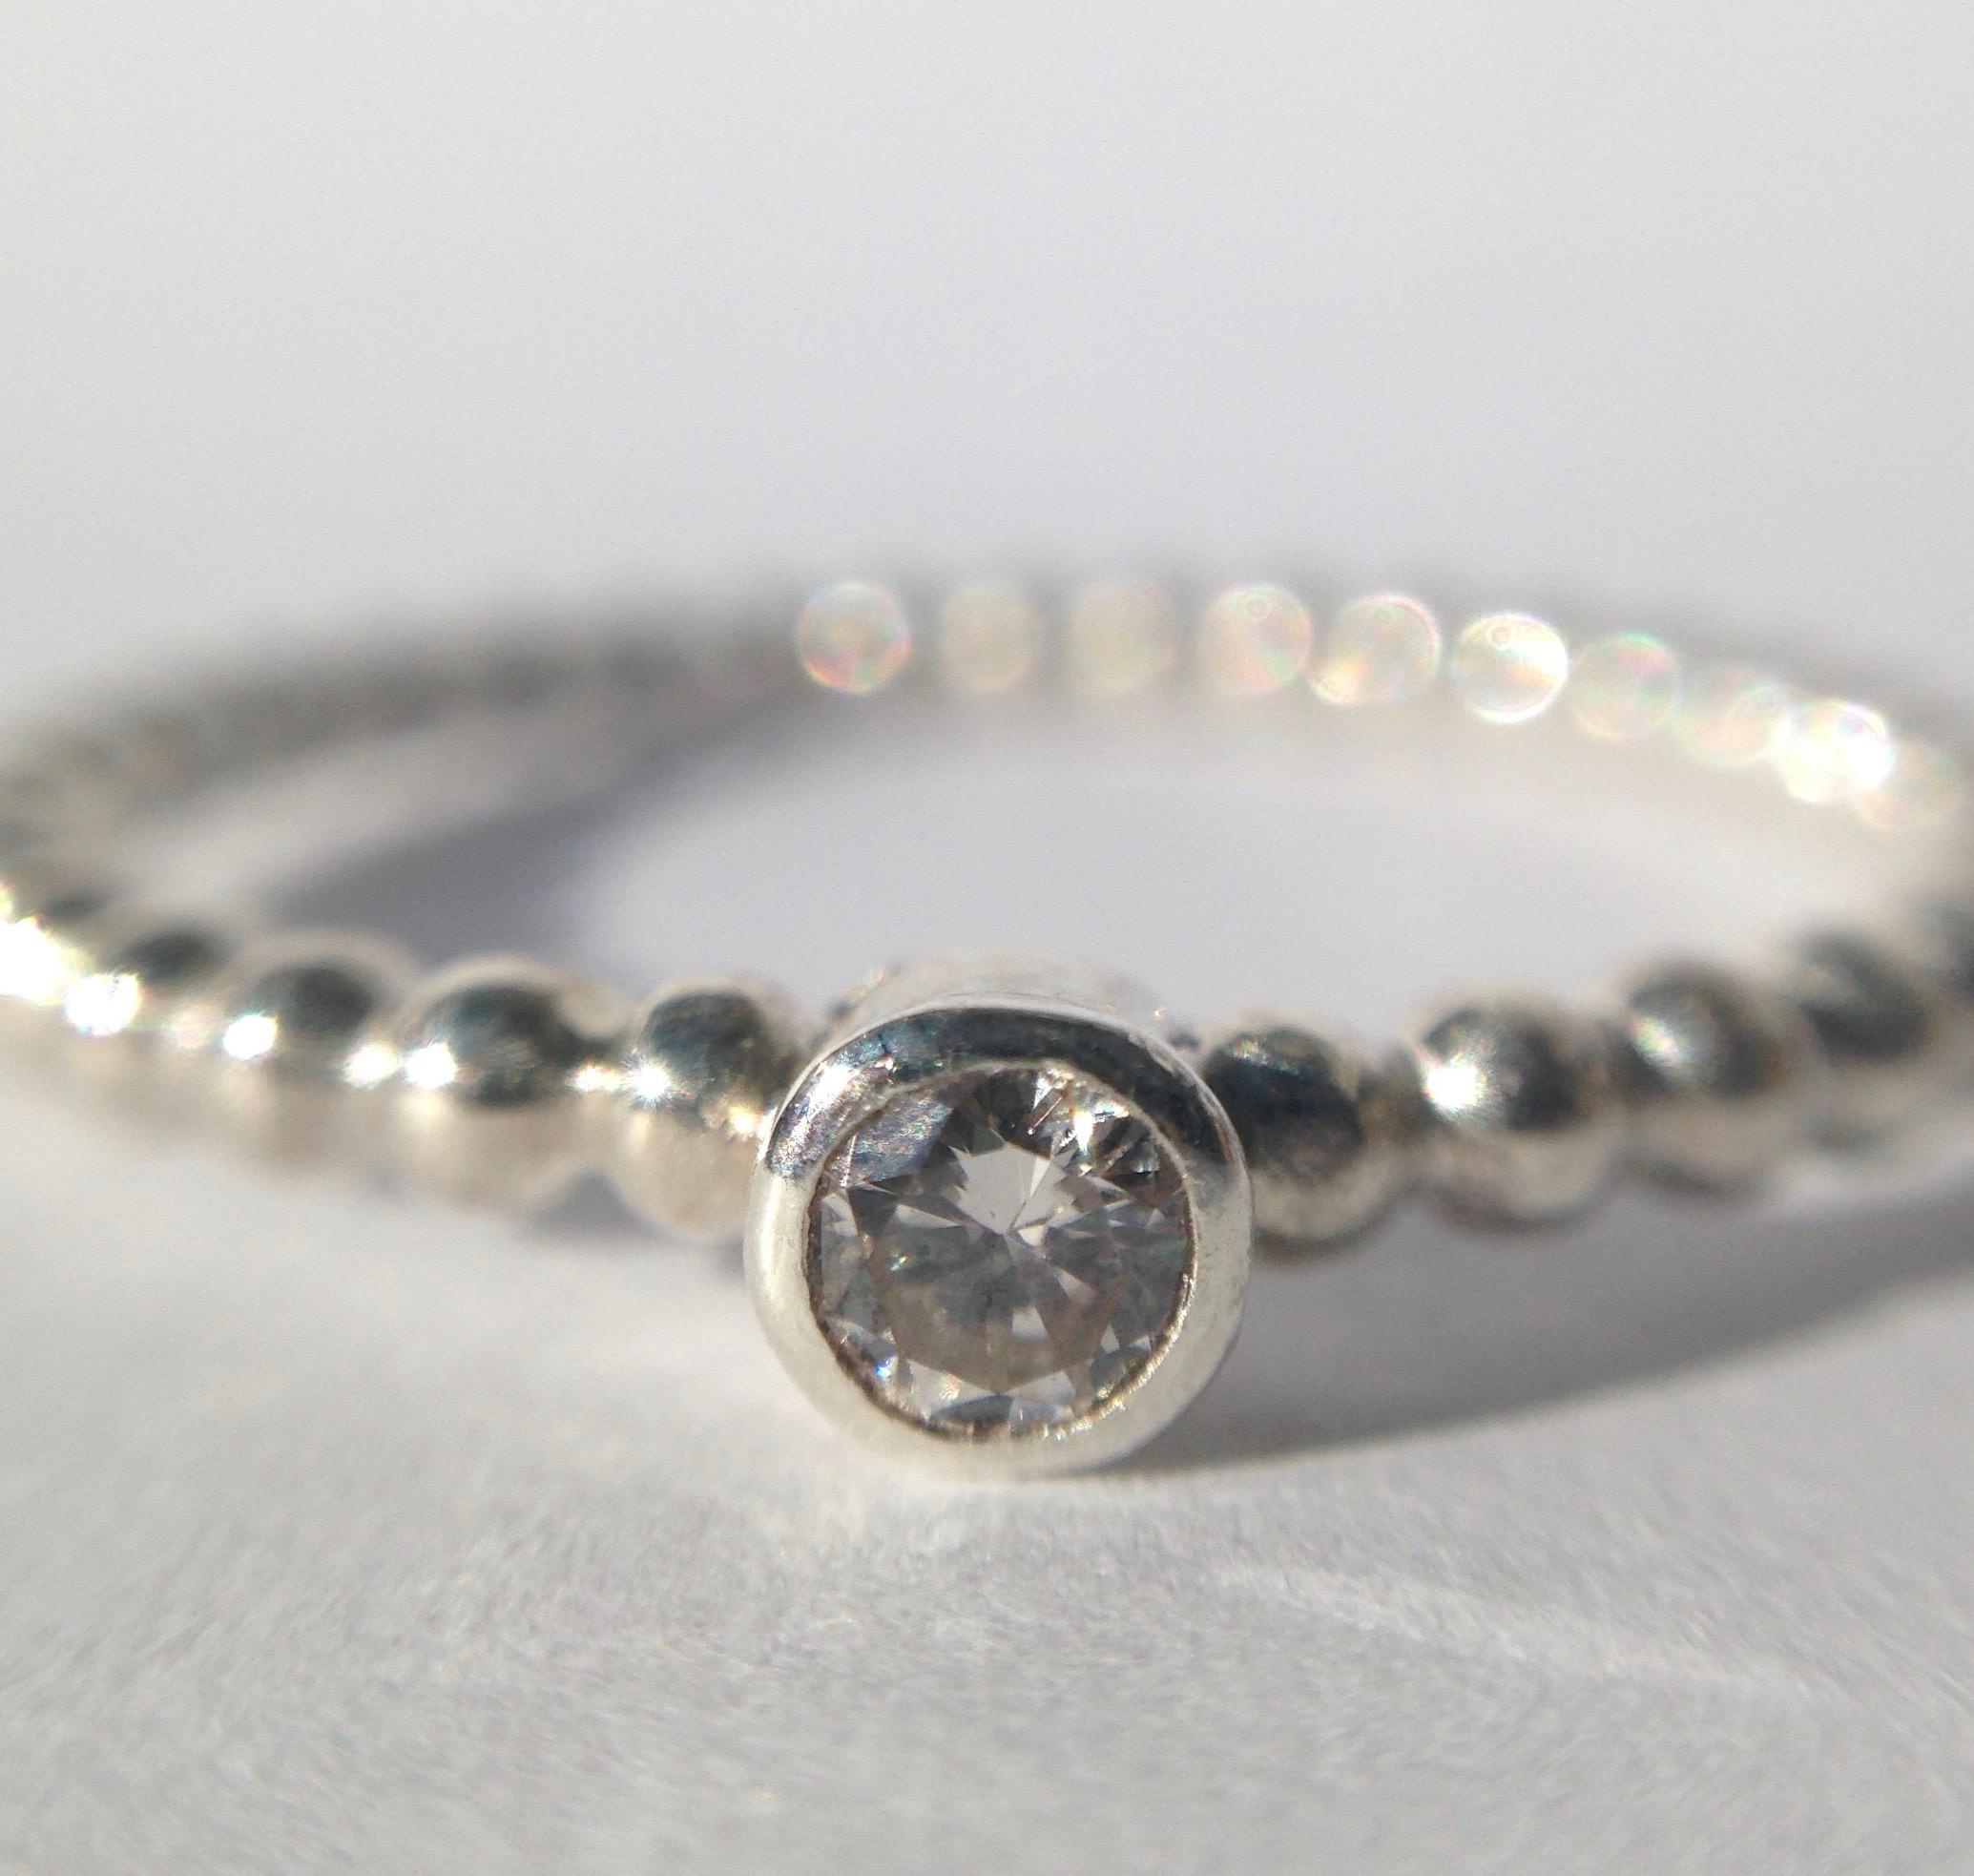 diamond engagement ring uk handmade contemporary sterling silver jewellery handmade in Exeter Devon UK jasmine bowden.jpg